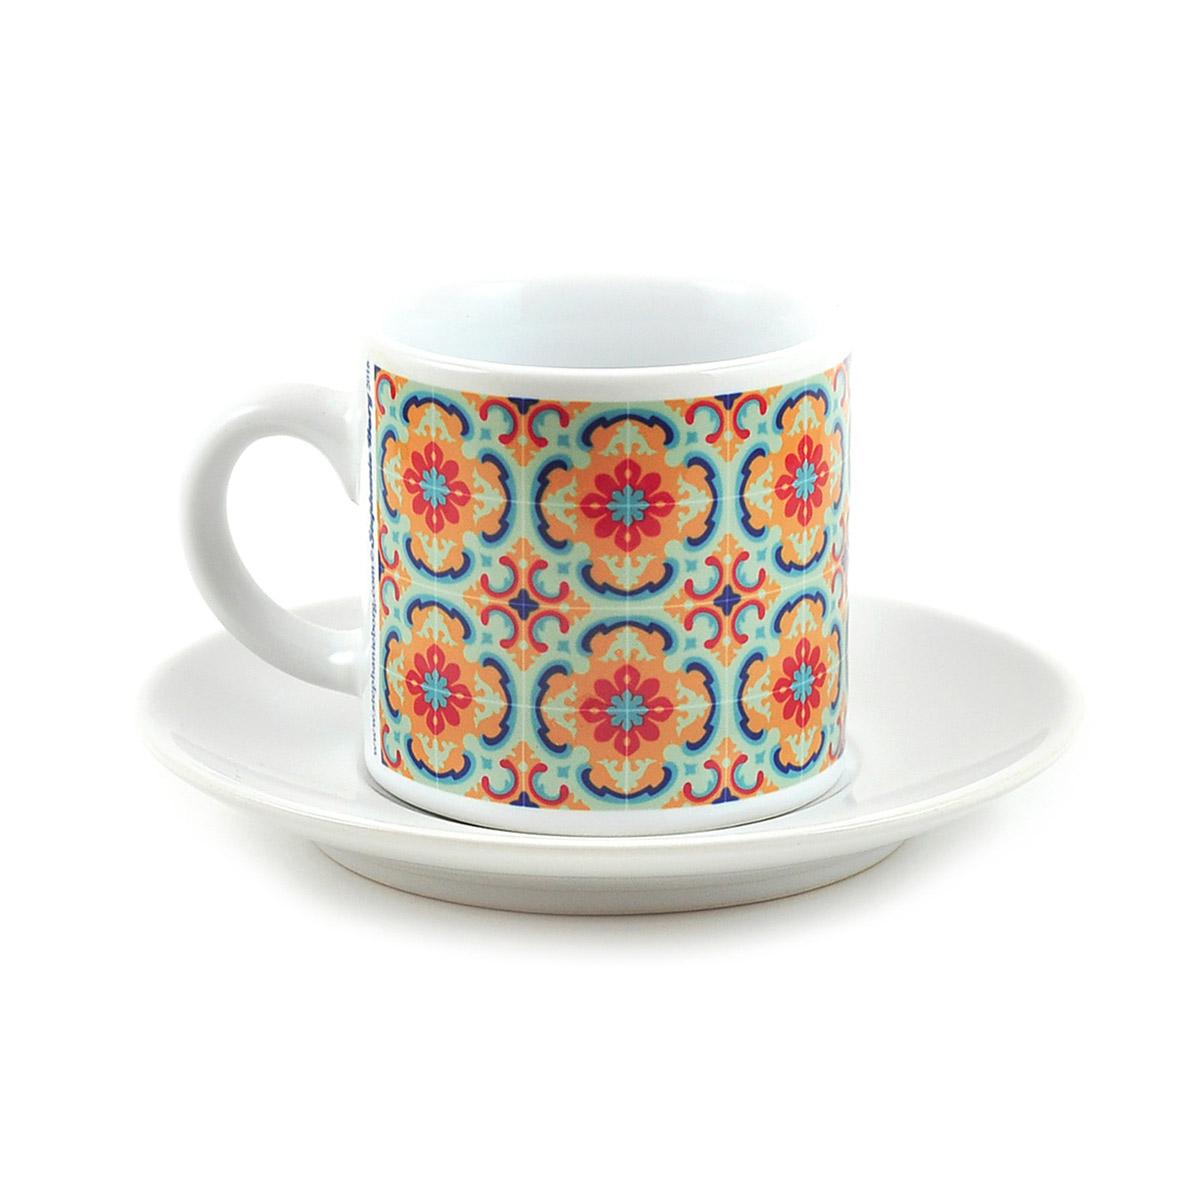 Malta Tile Espresso Cup & Saucer, pattern no.2